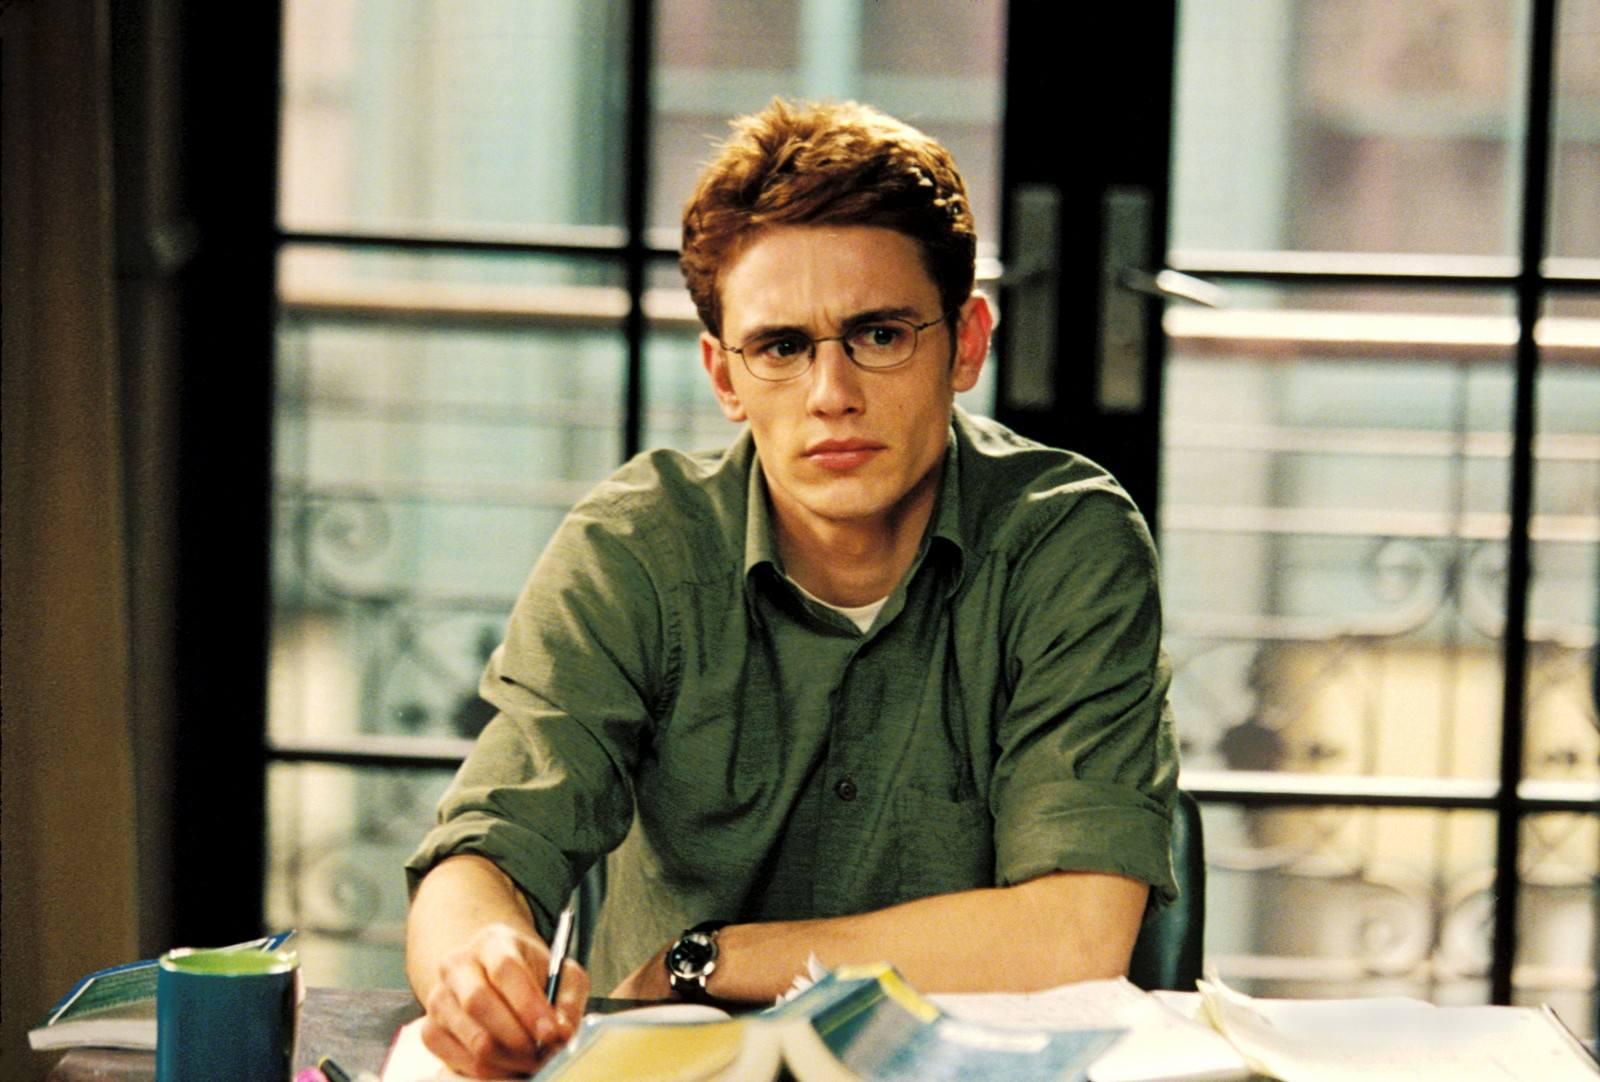 Movie, Spider-Man(美國, 2002年) / 蜘蛛人(台灣) / 蜘蛛侠(中國) / 蜘蛛俠(香港), 電影劇照, 角色與演員介紹